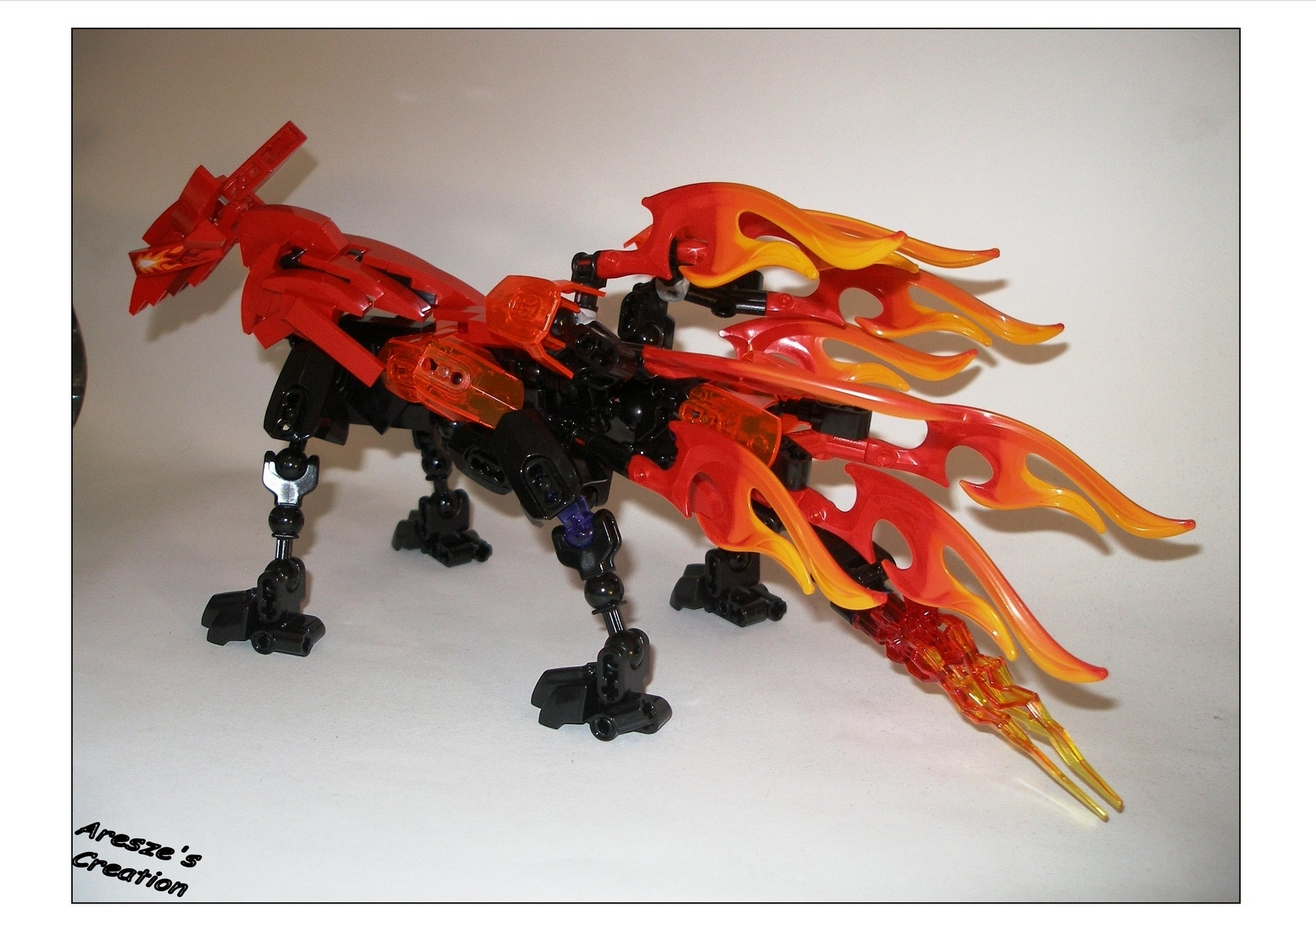 aresze moc - Nine-tailed Fox 004